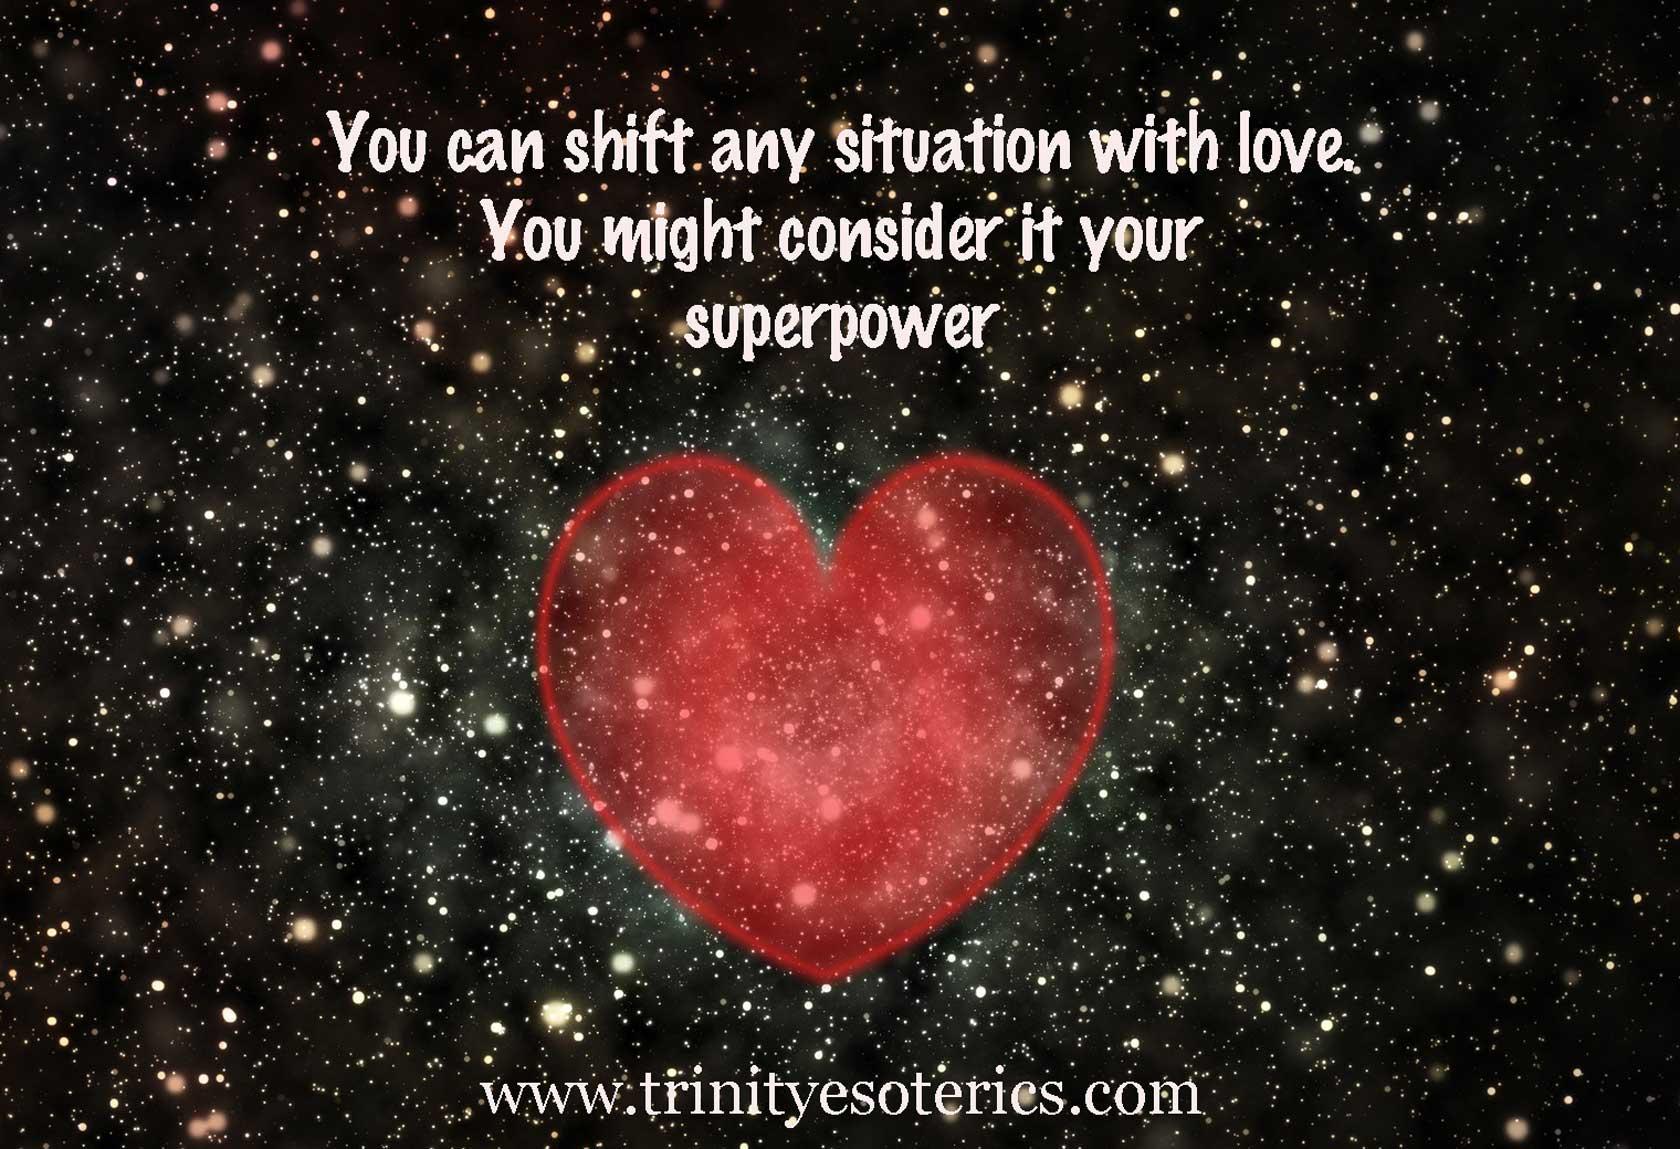 shimmering heart in universe trinity esoterics